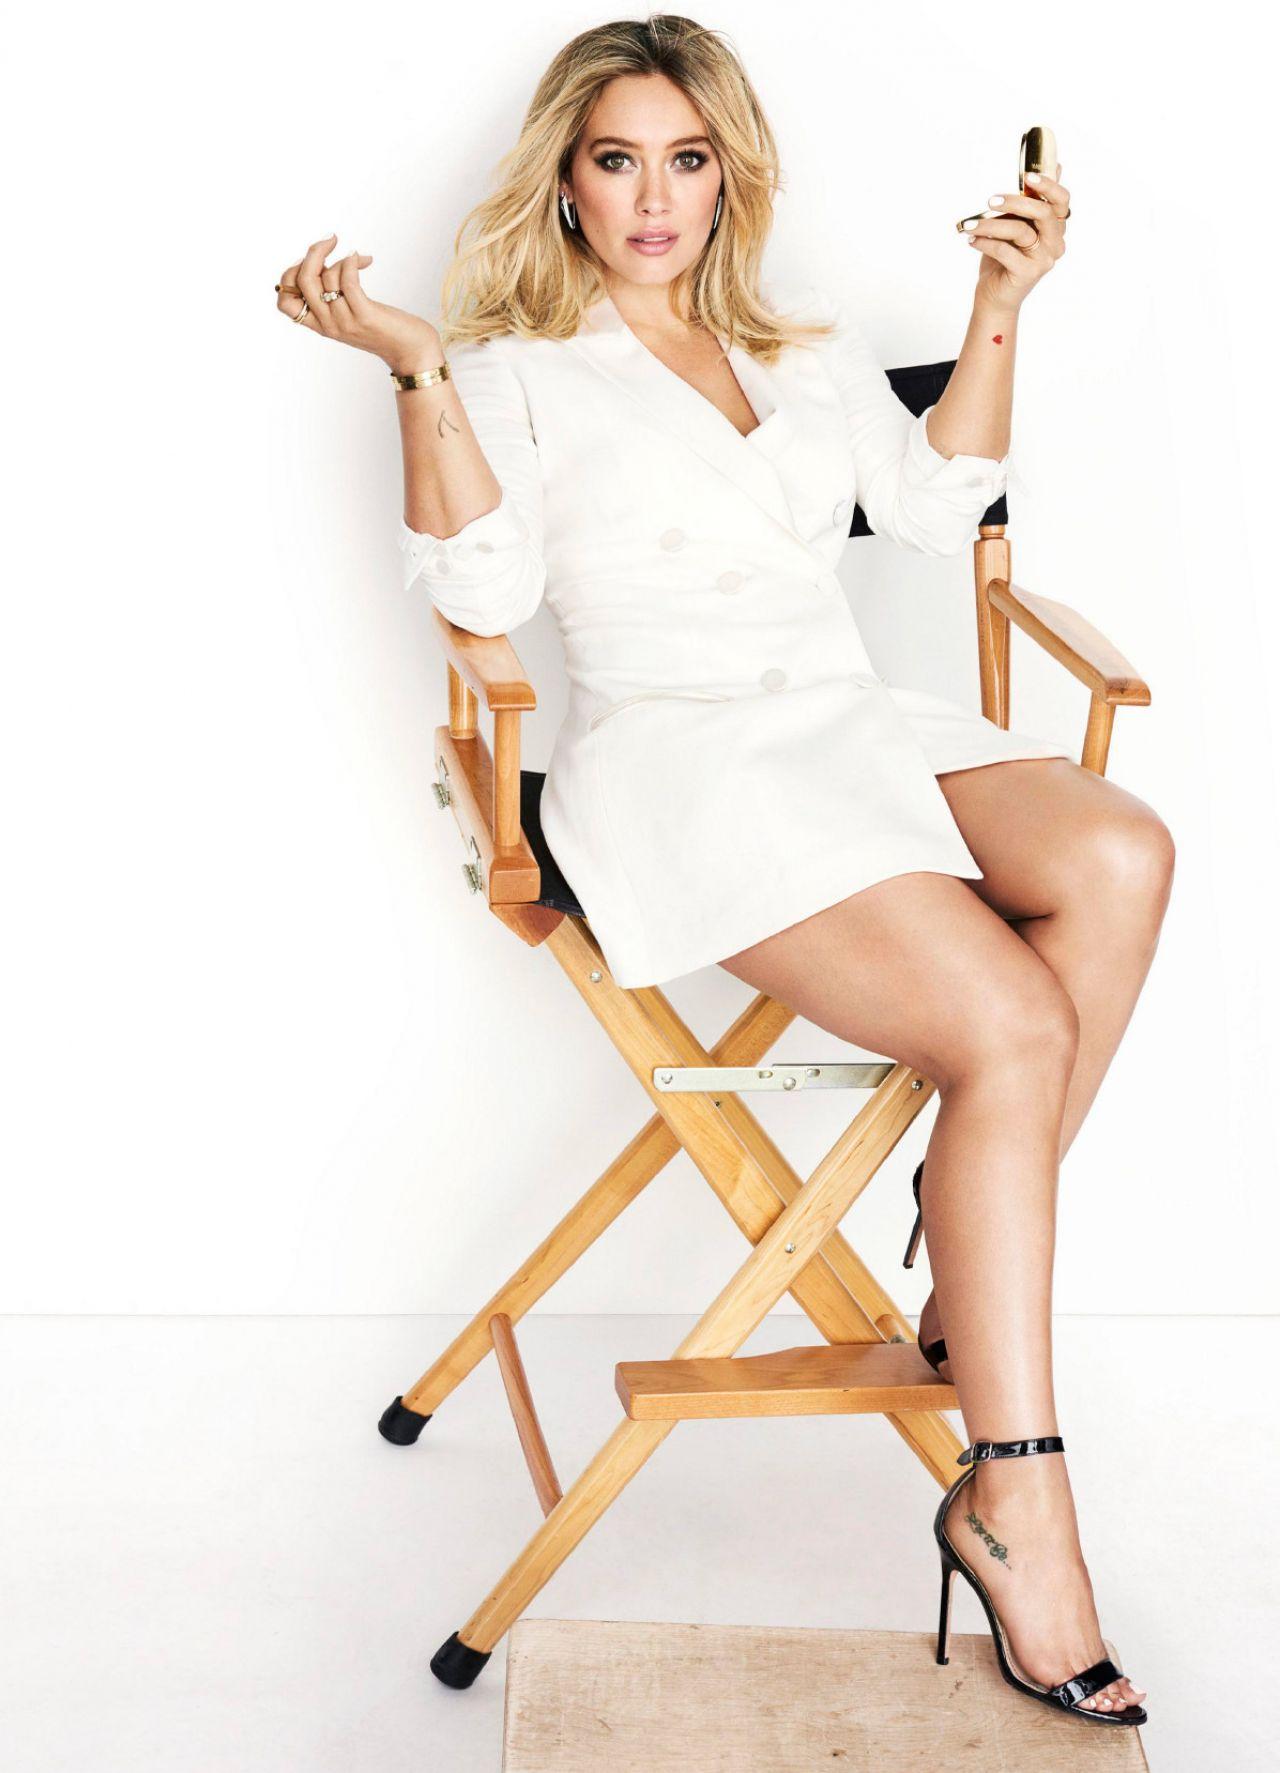 Hilary Duff Cosmopolitan Feb 2017